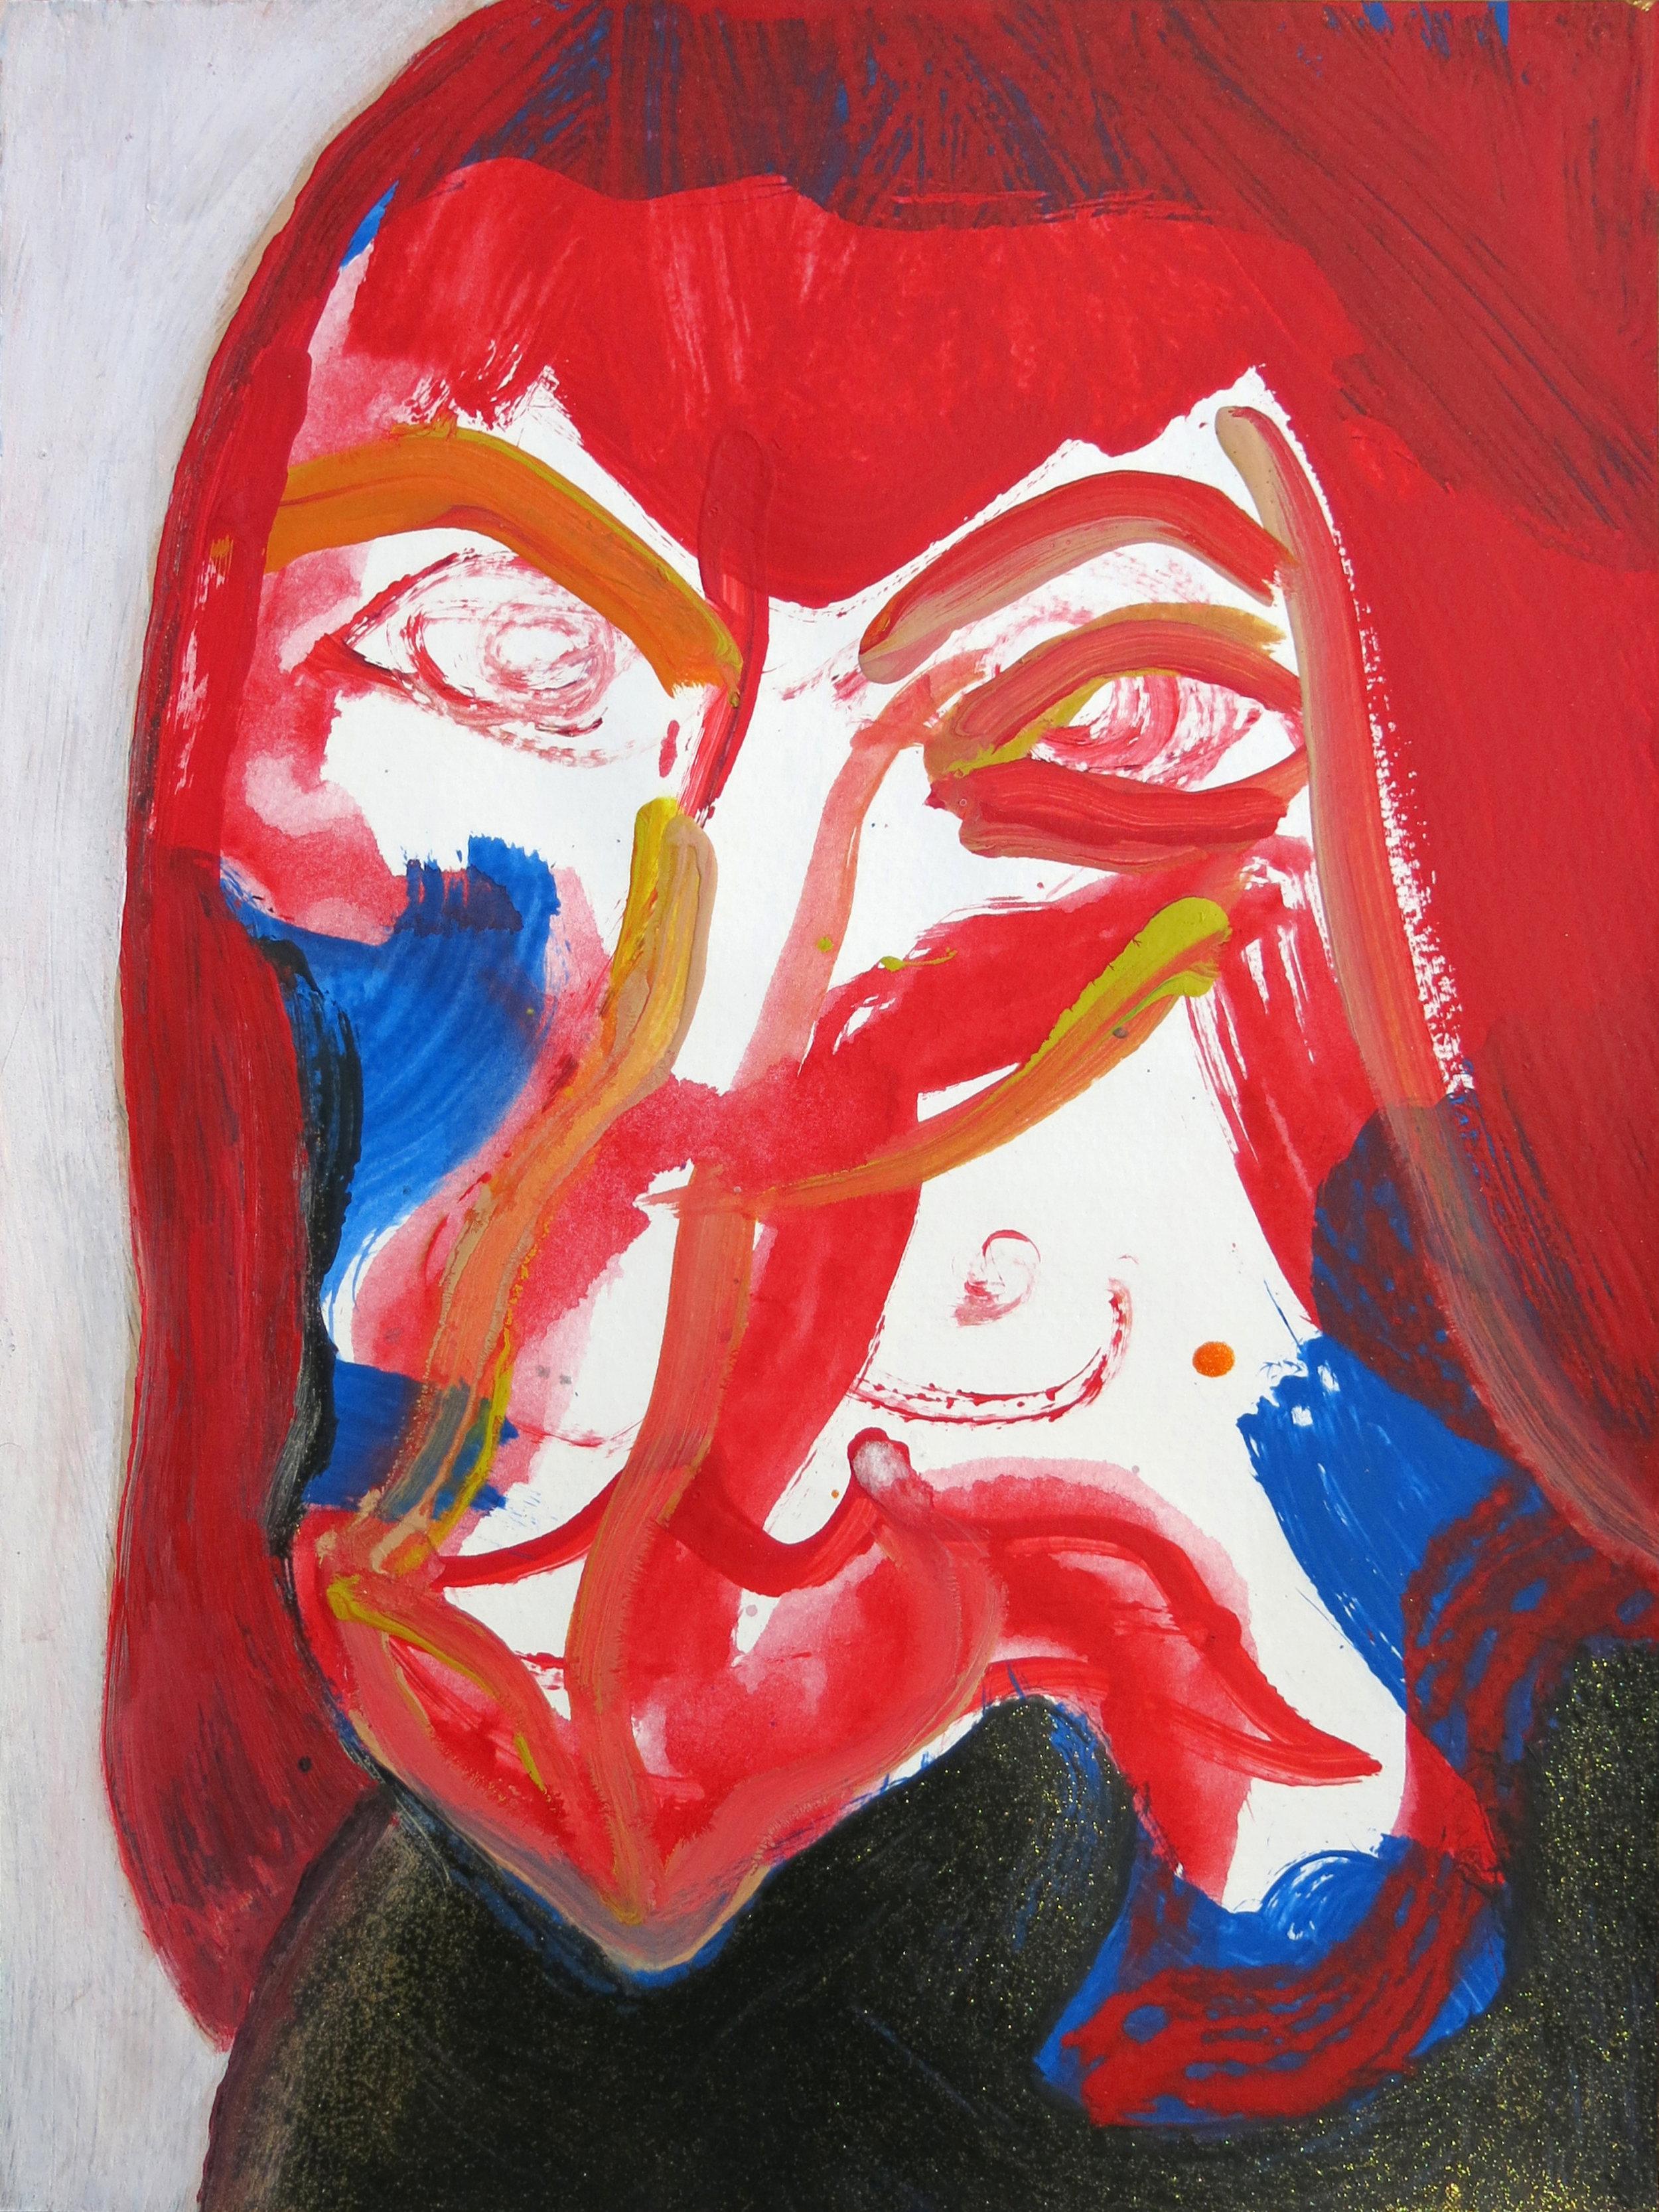 Barbra Streisand Portrait #221